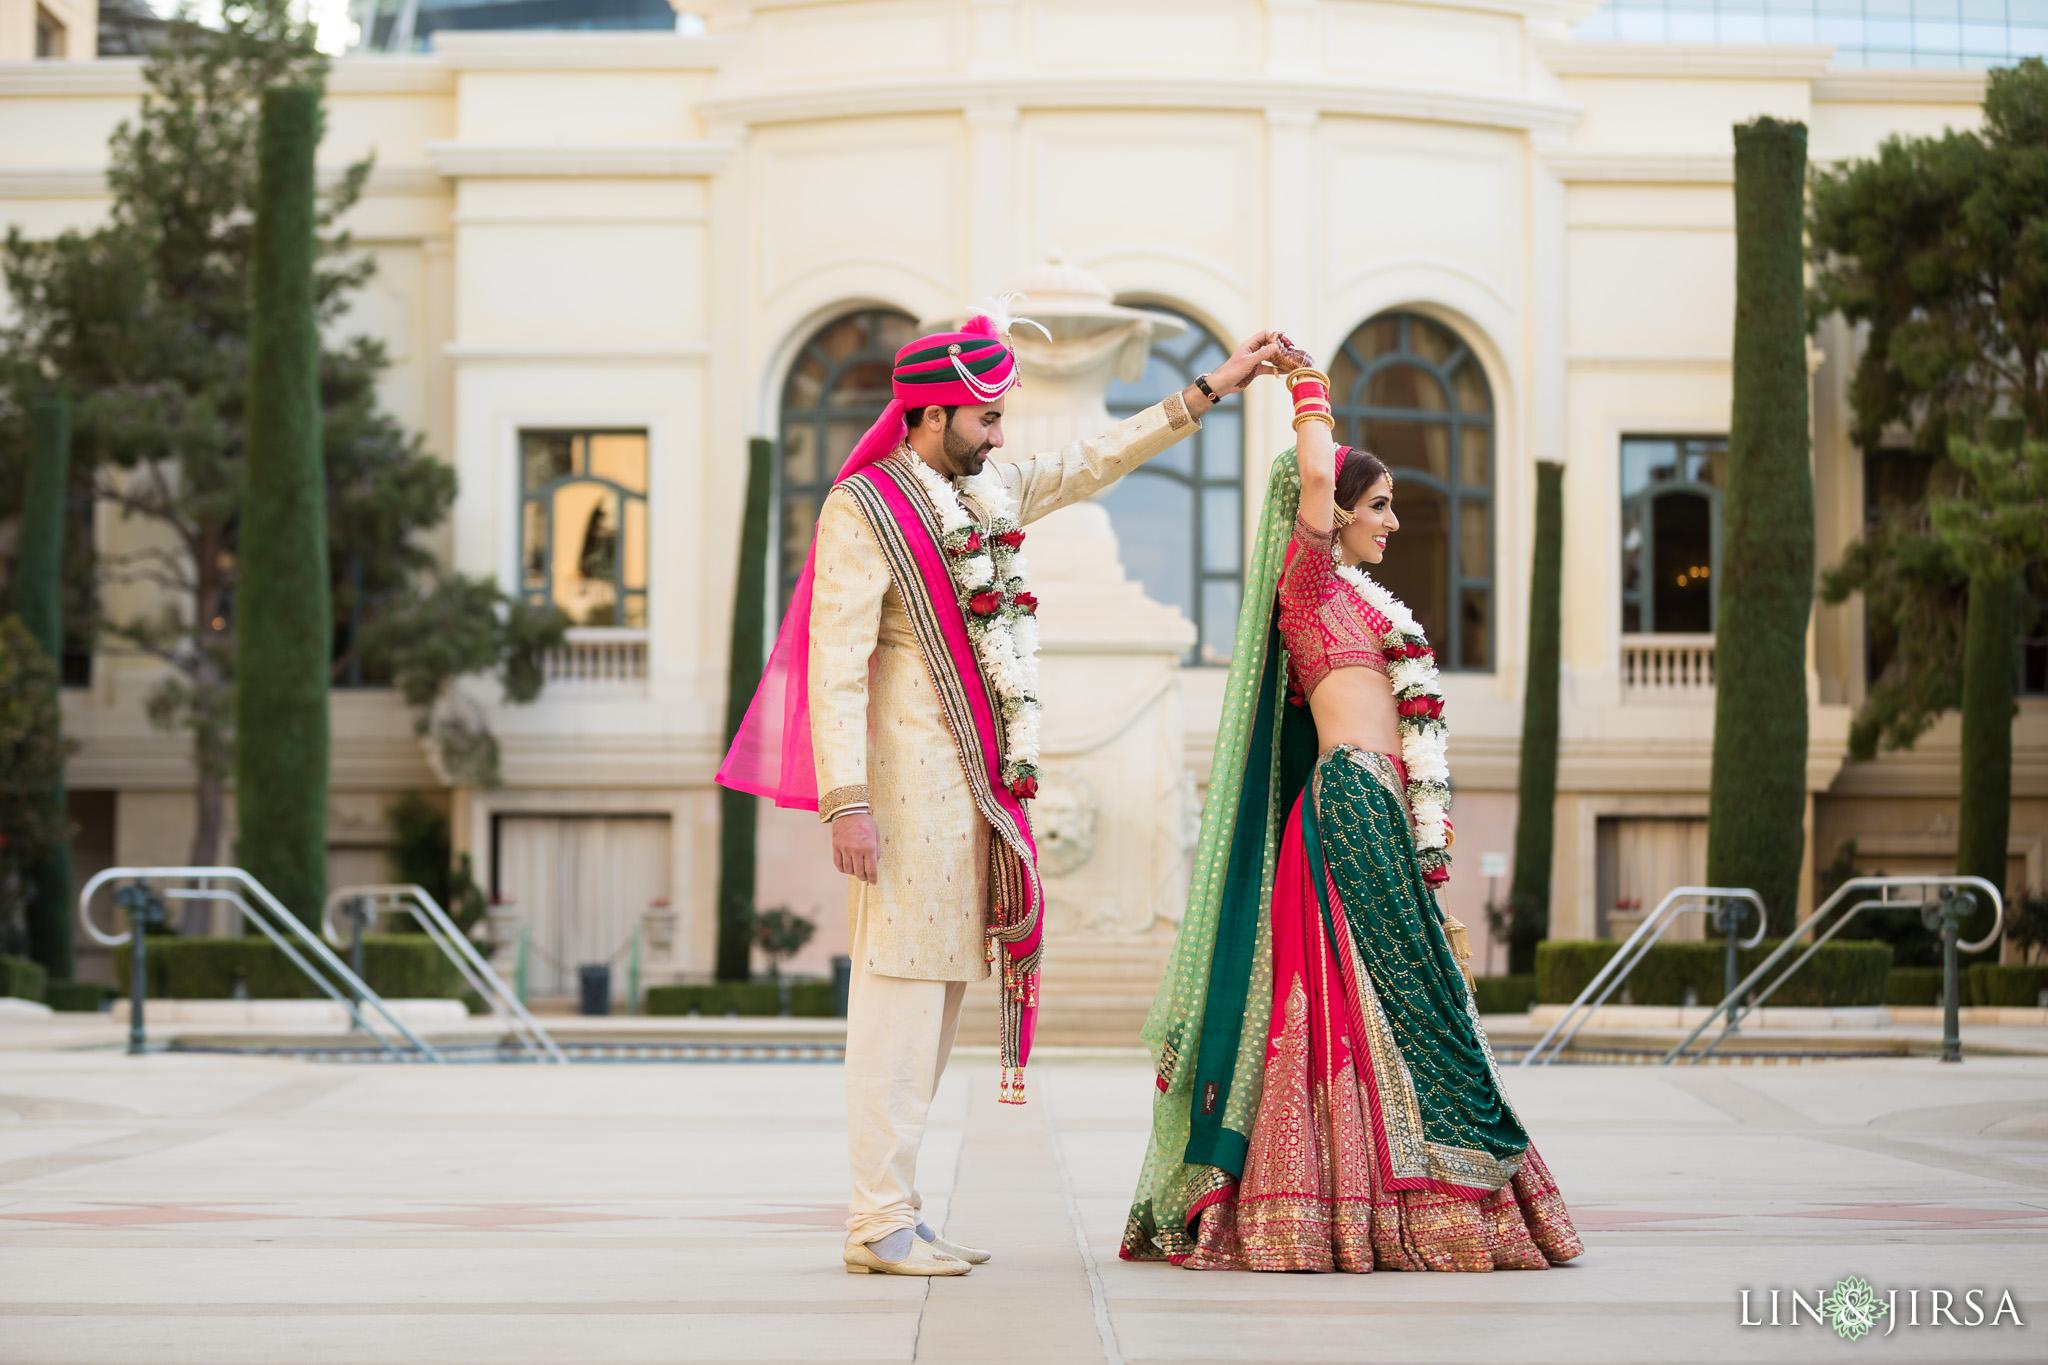 25-bellagio-las-vegas-indian-wedding-photography